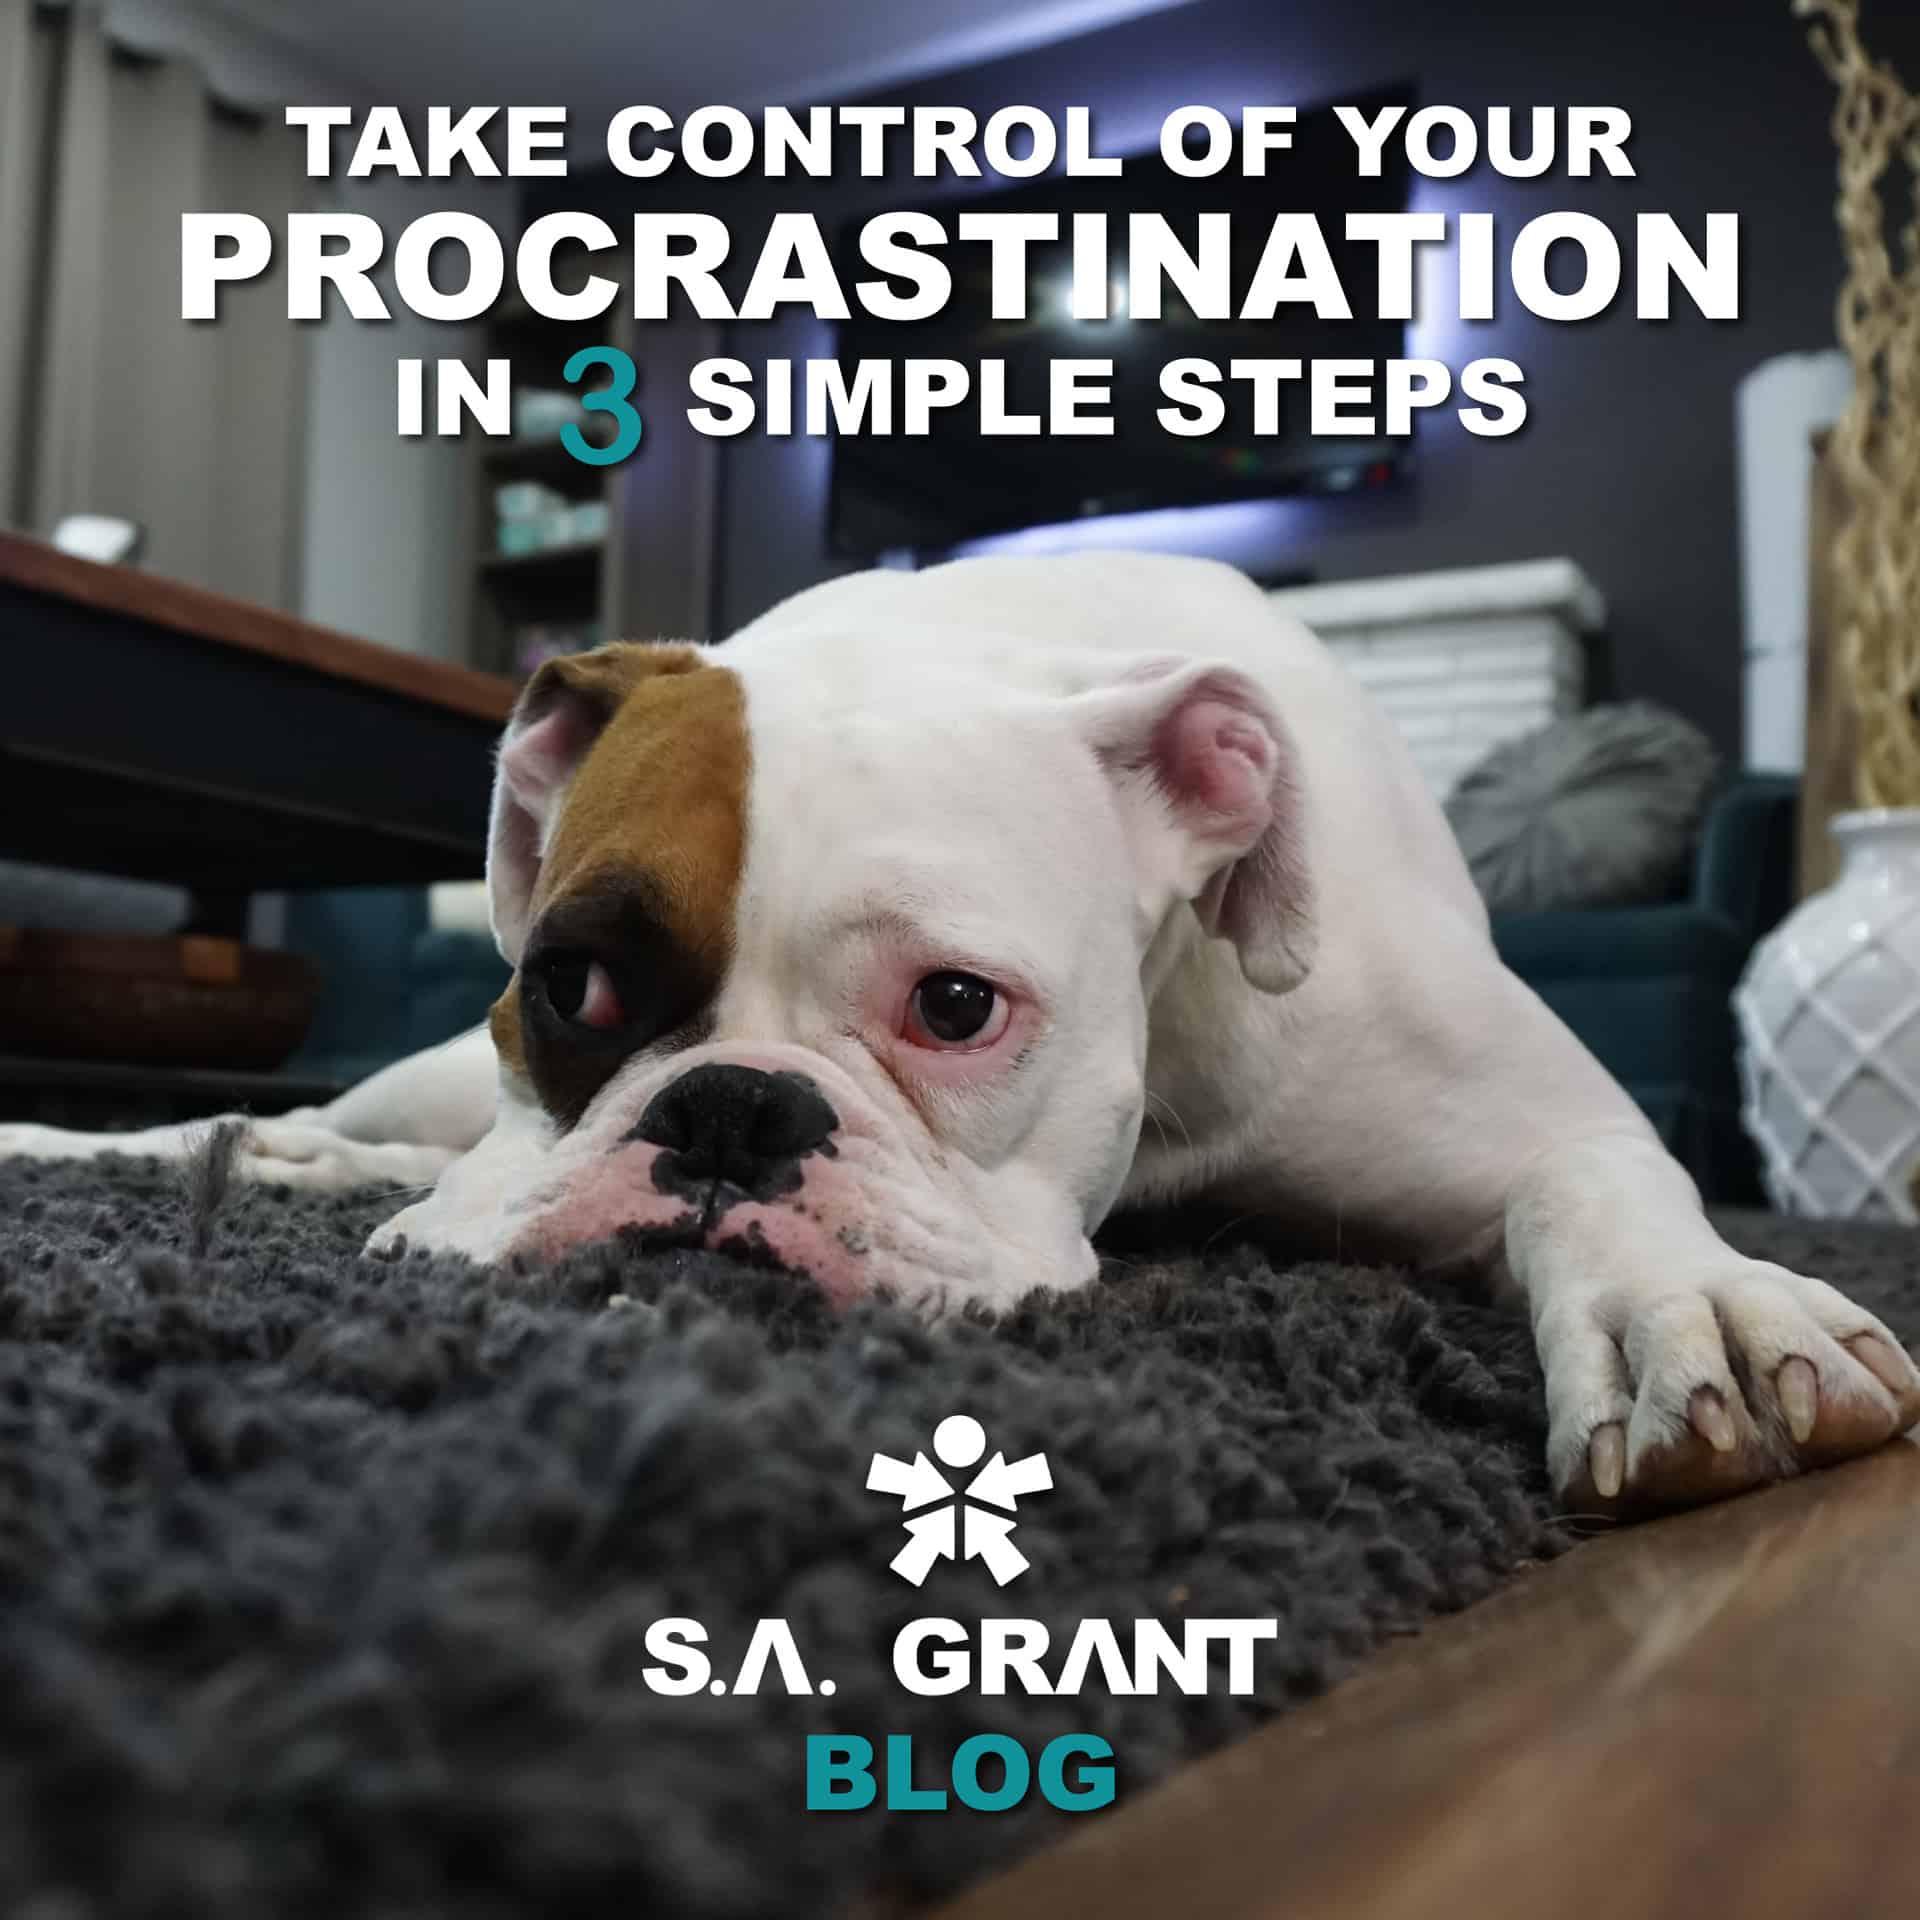 Take Control Of Your Procrastination In 3 Simple Steps - sagrant.com Blog #Procrastination